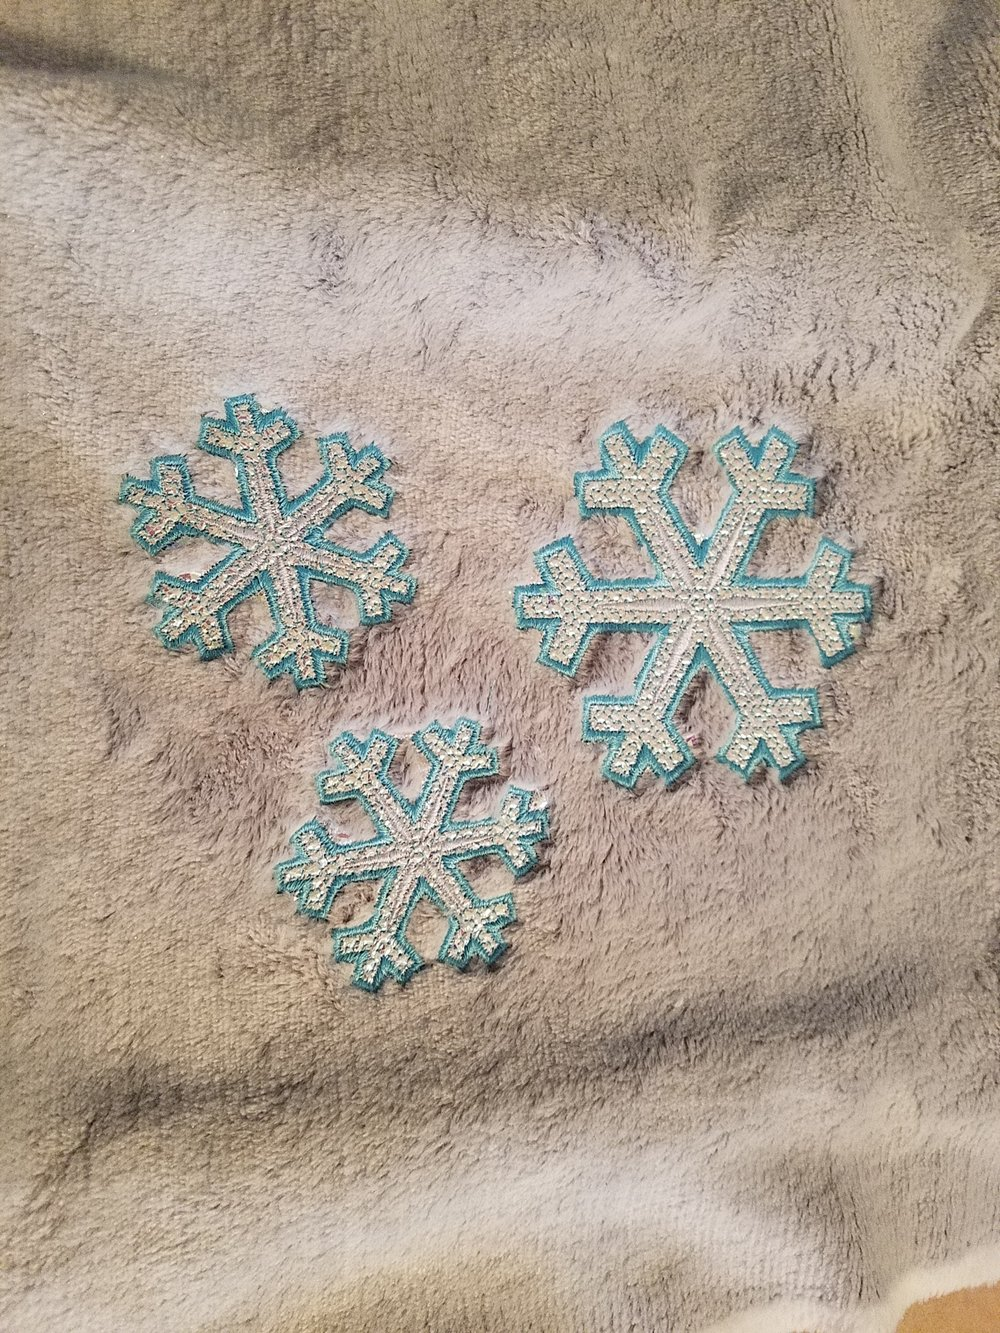 2018-12 Kimberbell Winter Snowflakes FSL.jpg